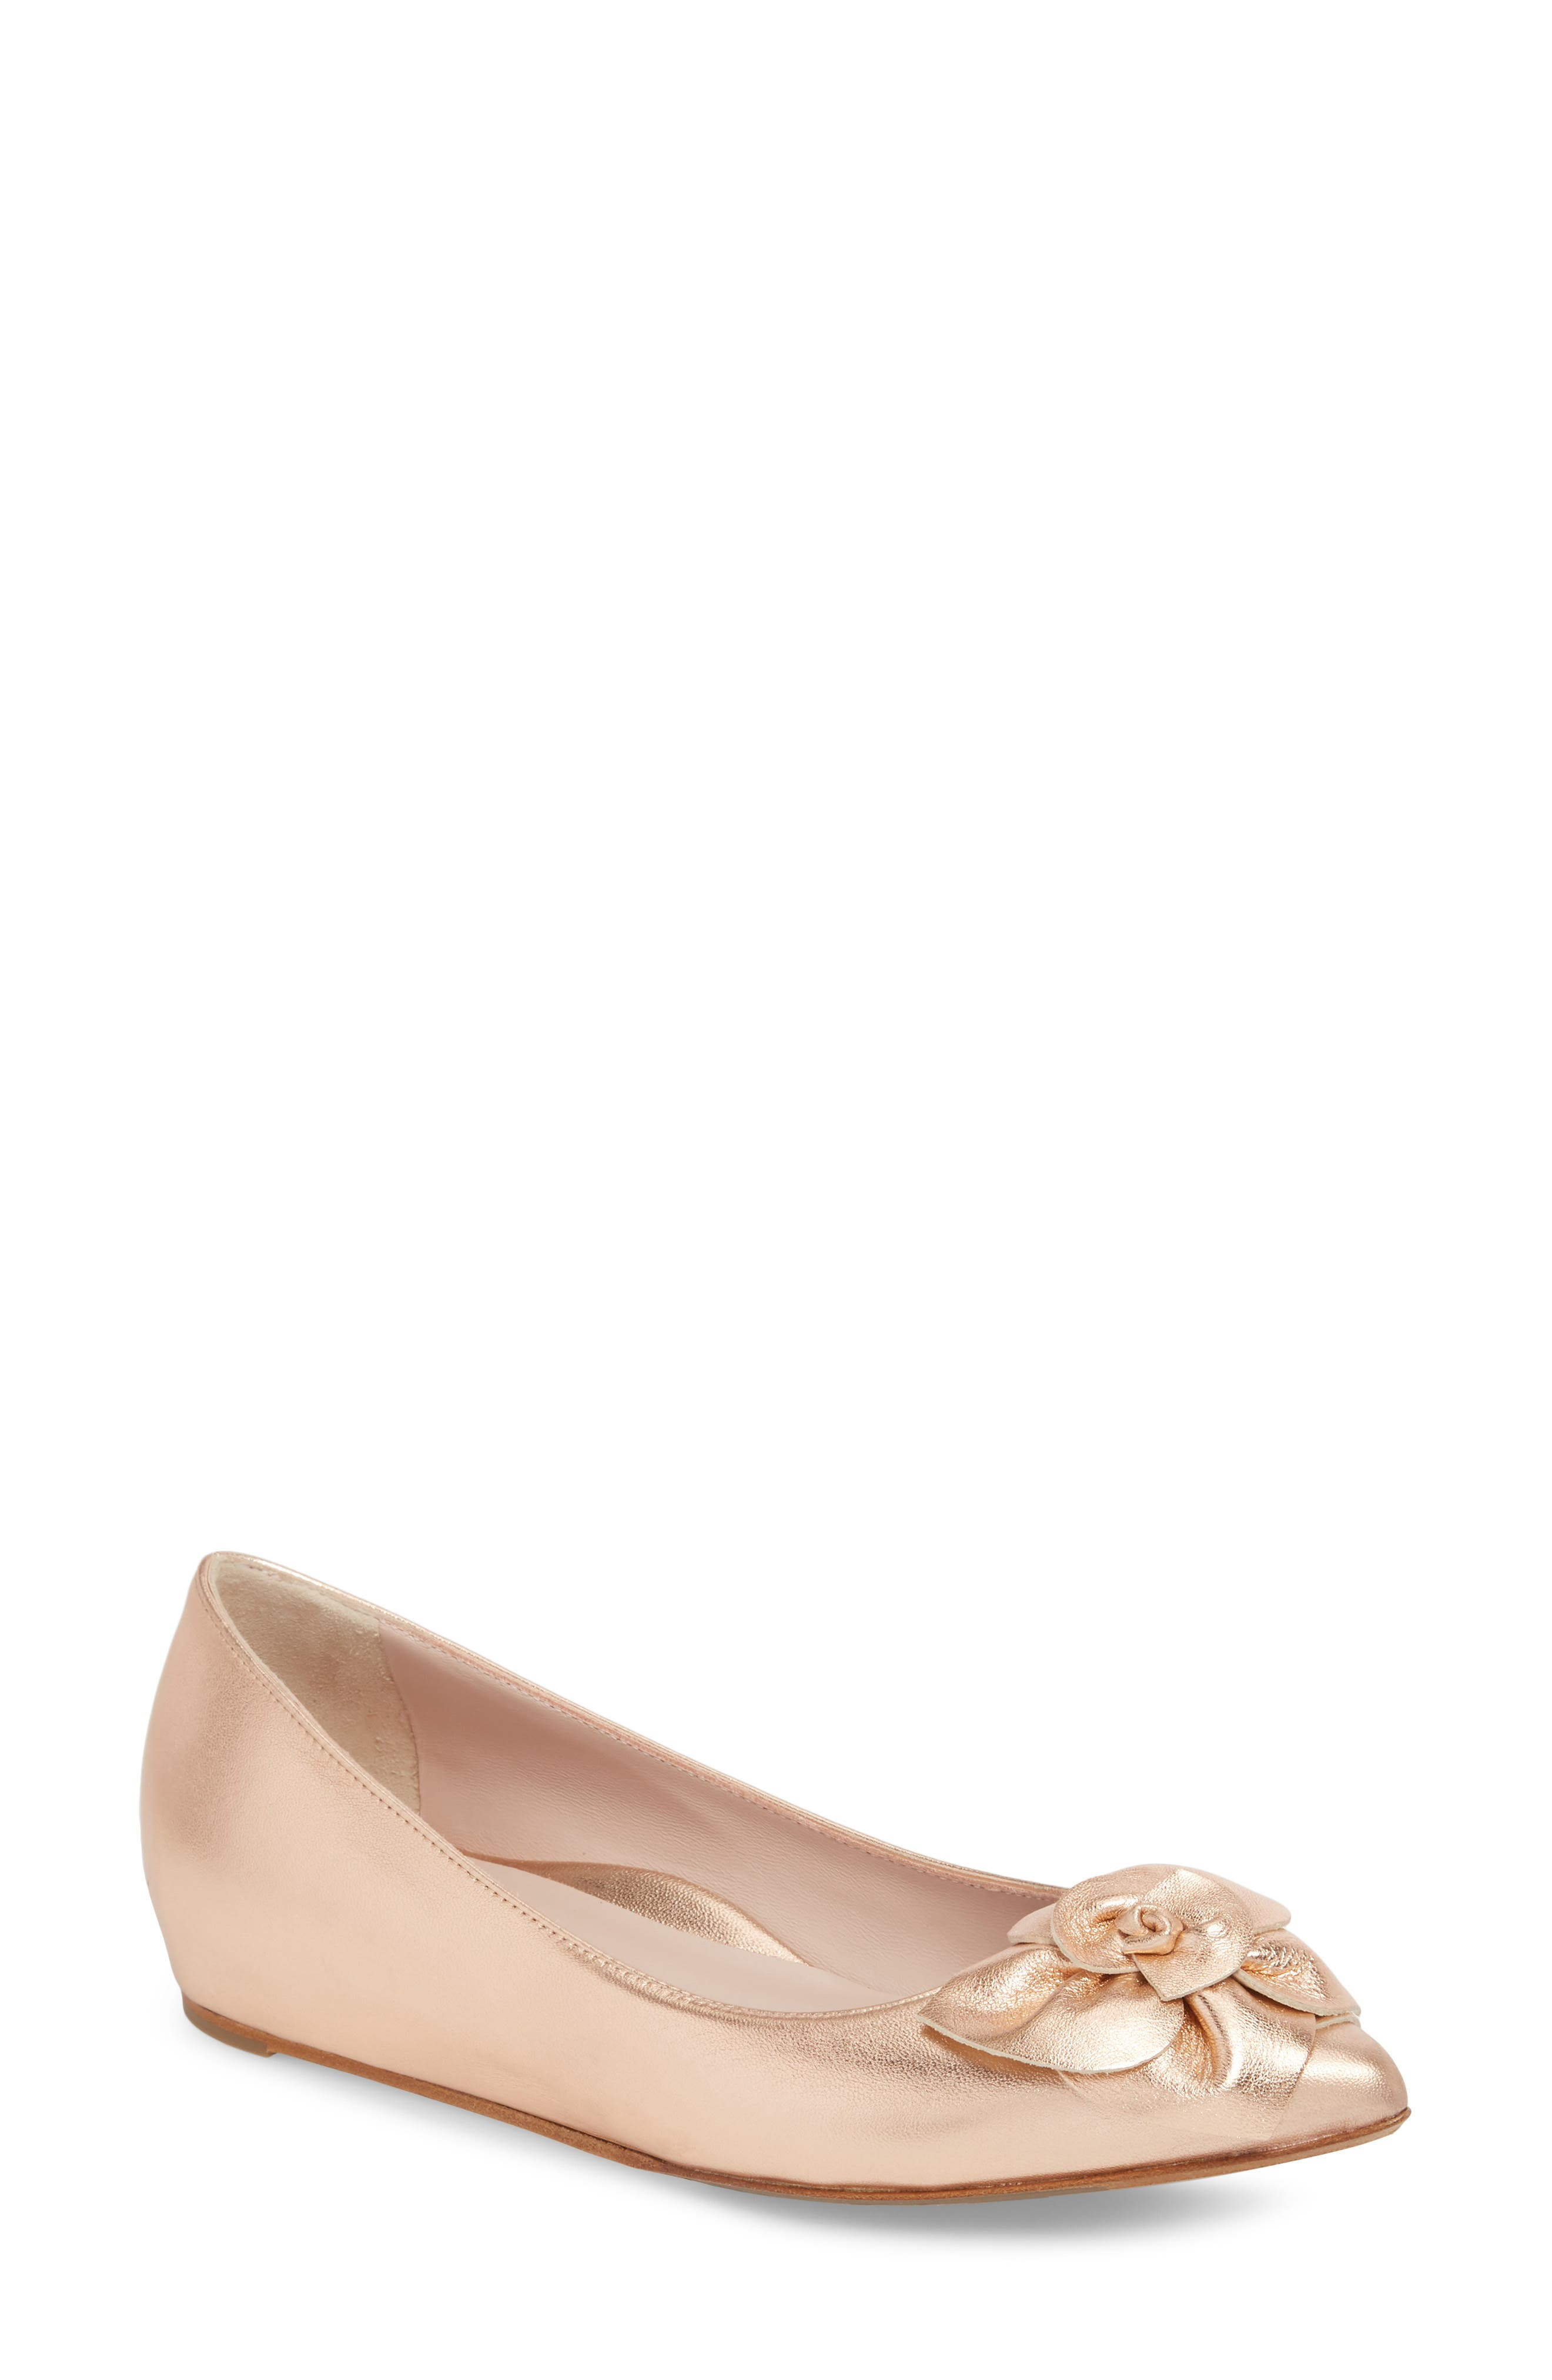 Taryn Rose Collection Rialta Flat